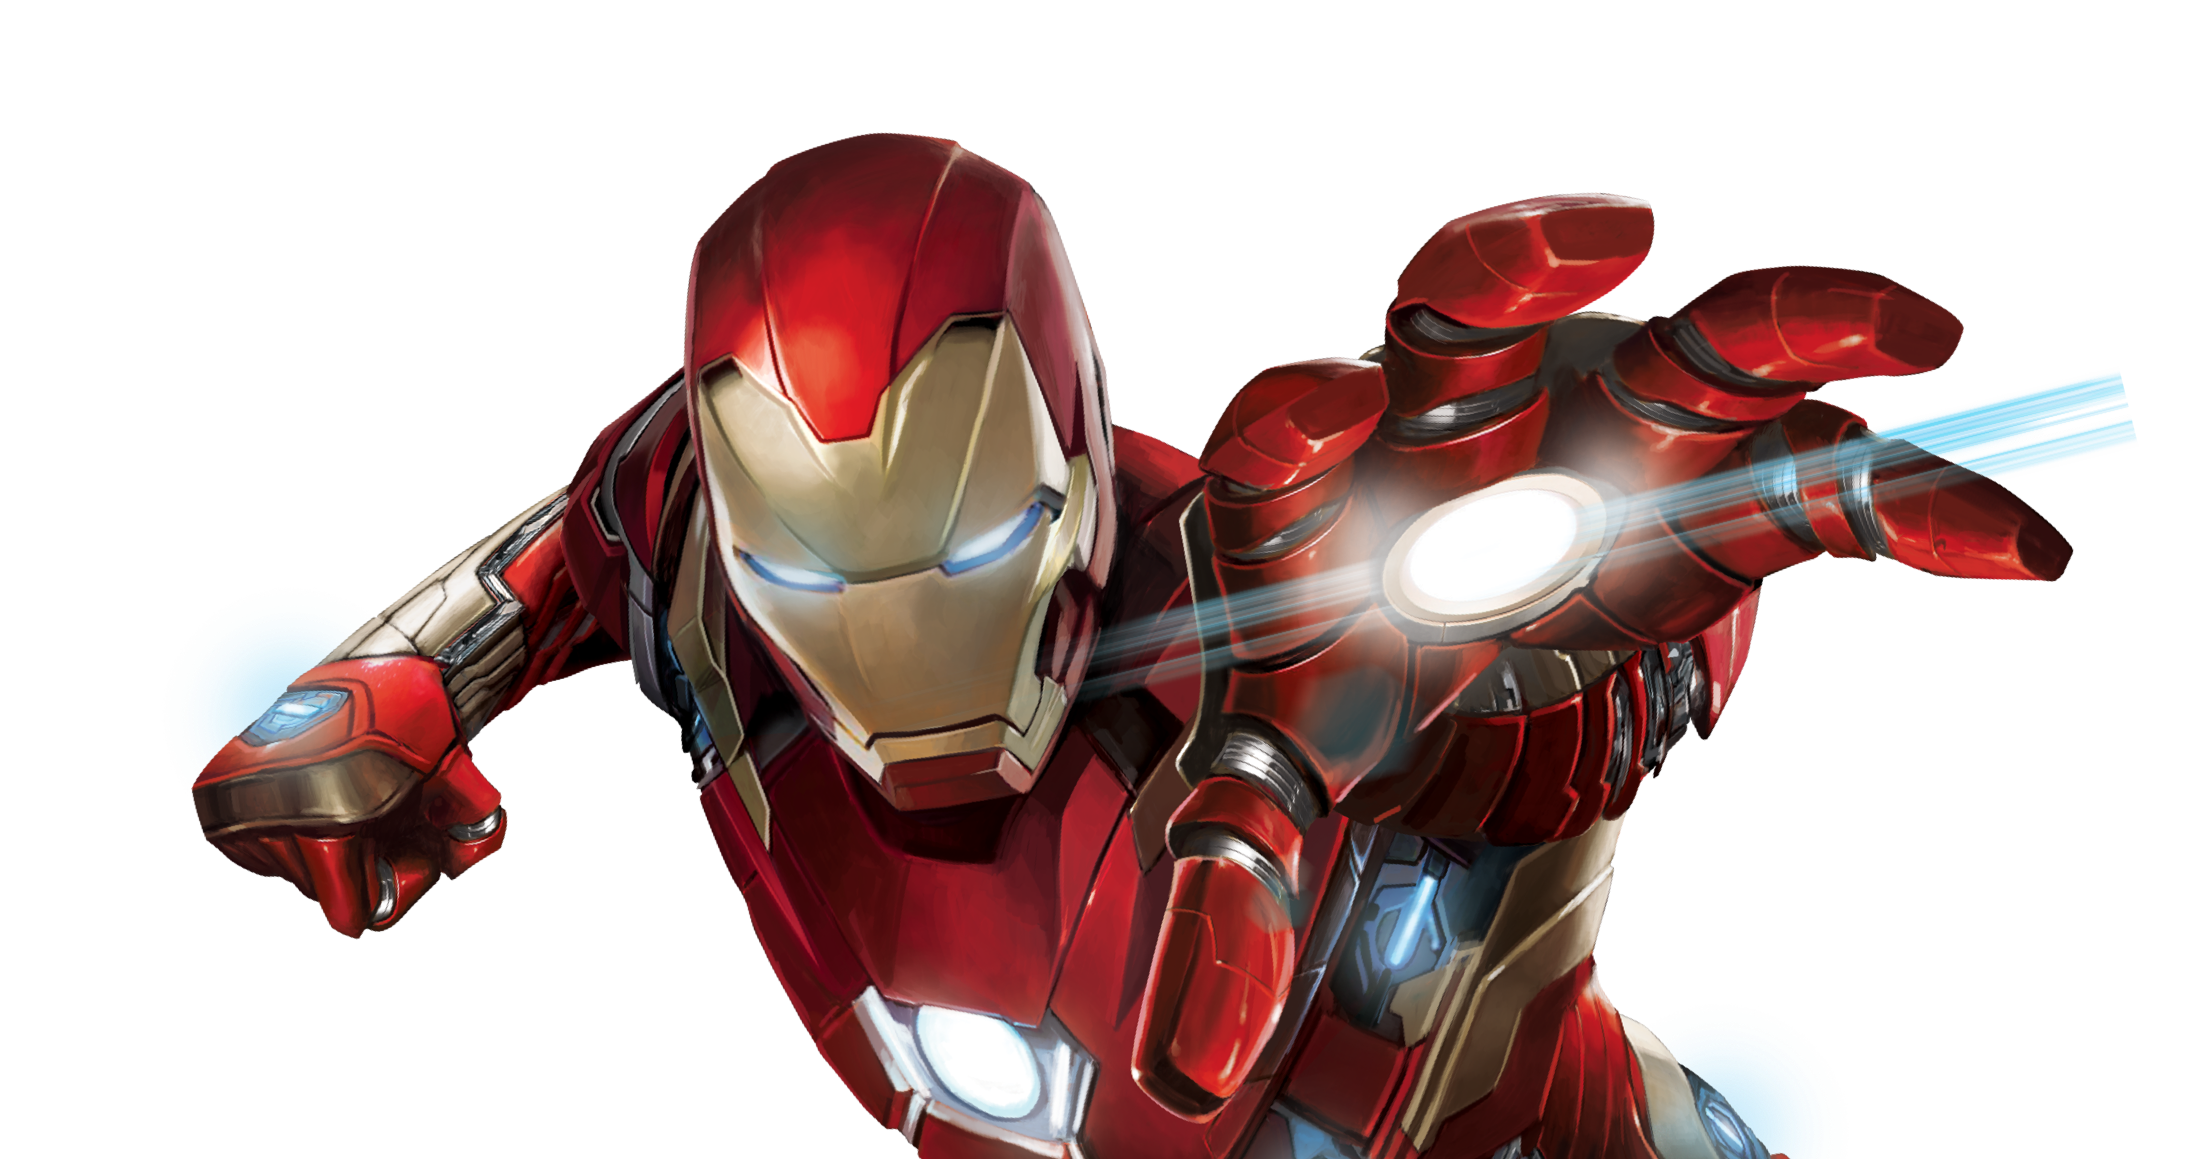 Iron Man Flying Png Transparent Image - Iron Man, Transparent background PNG HD thumbnail